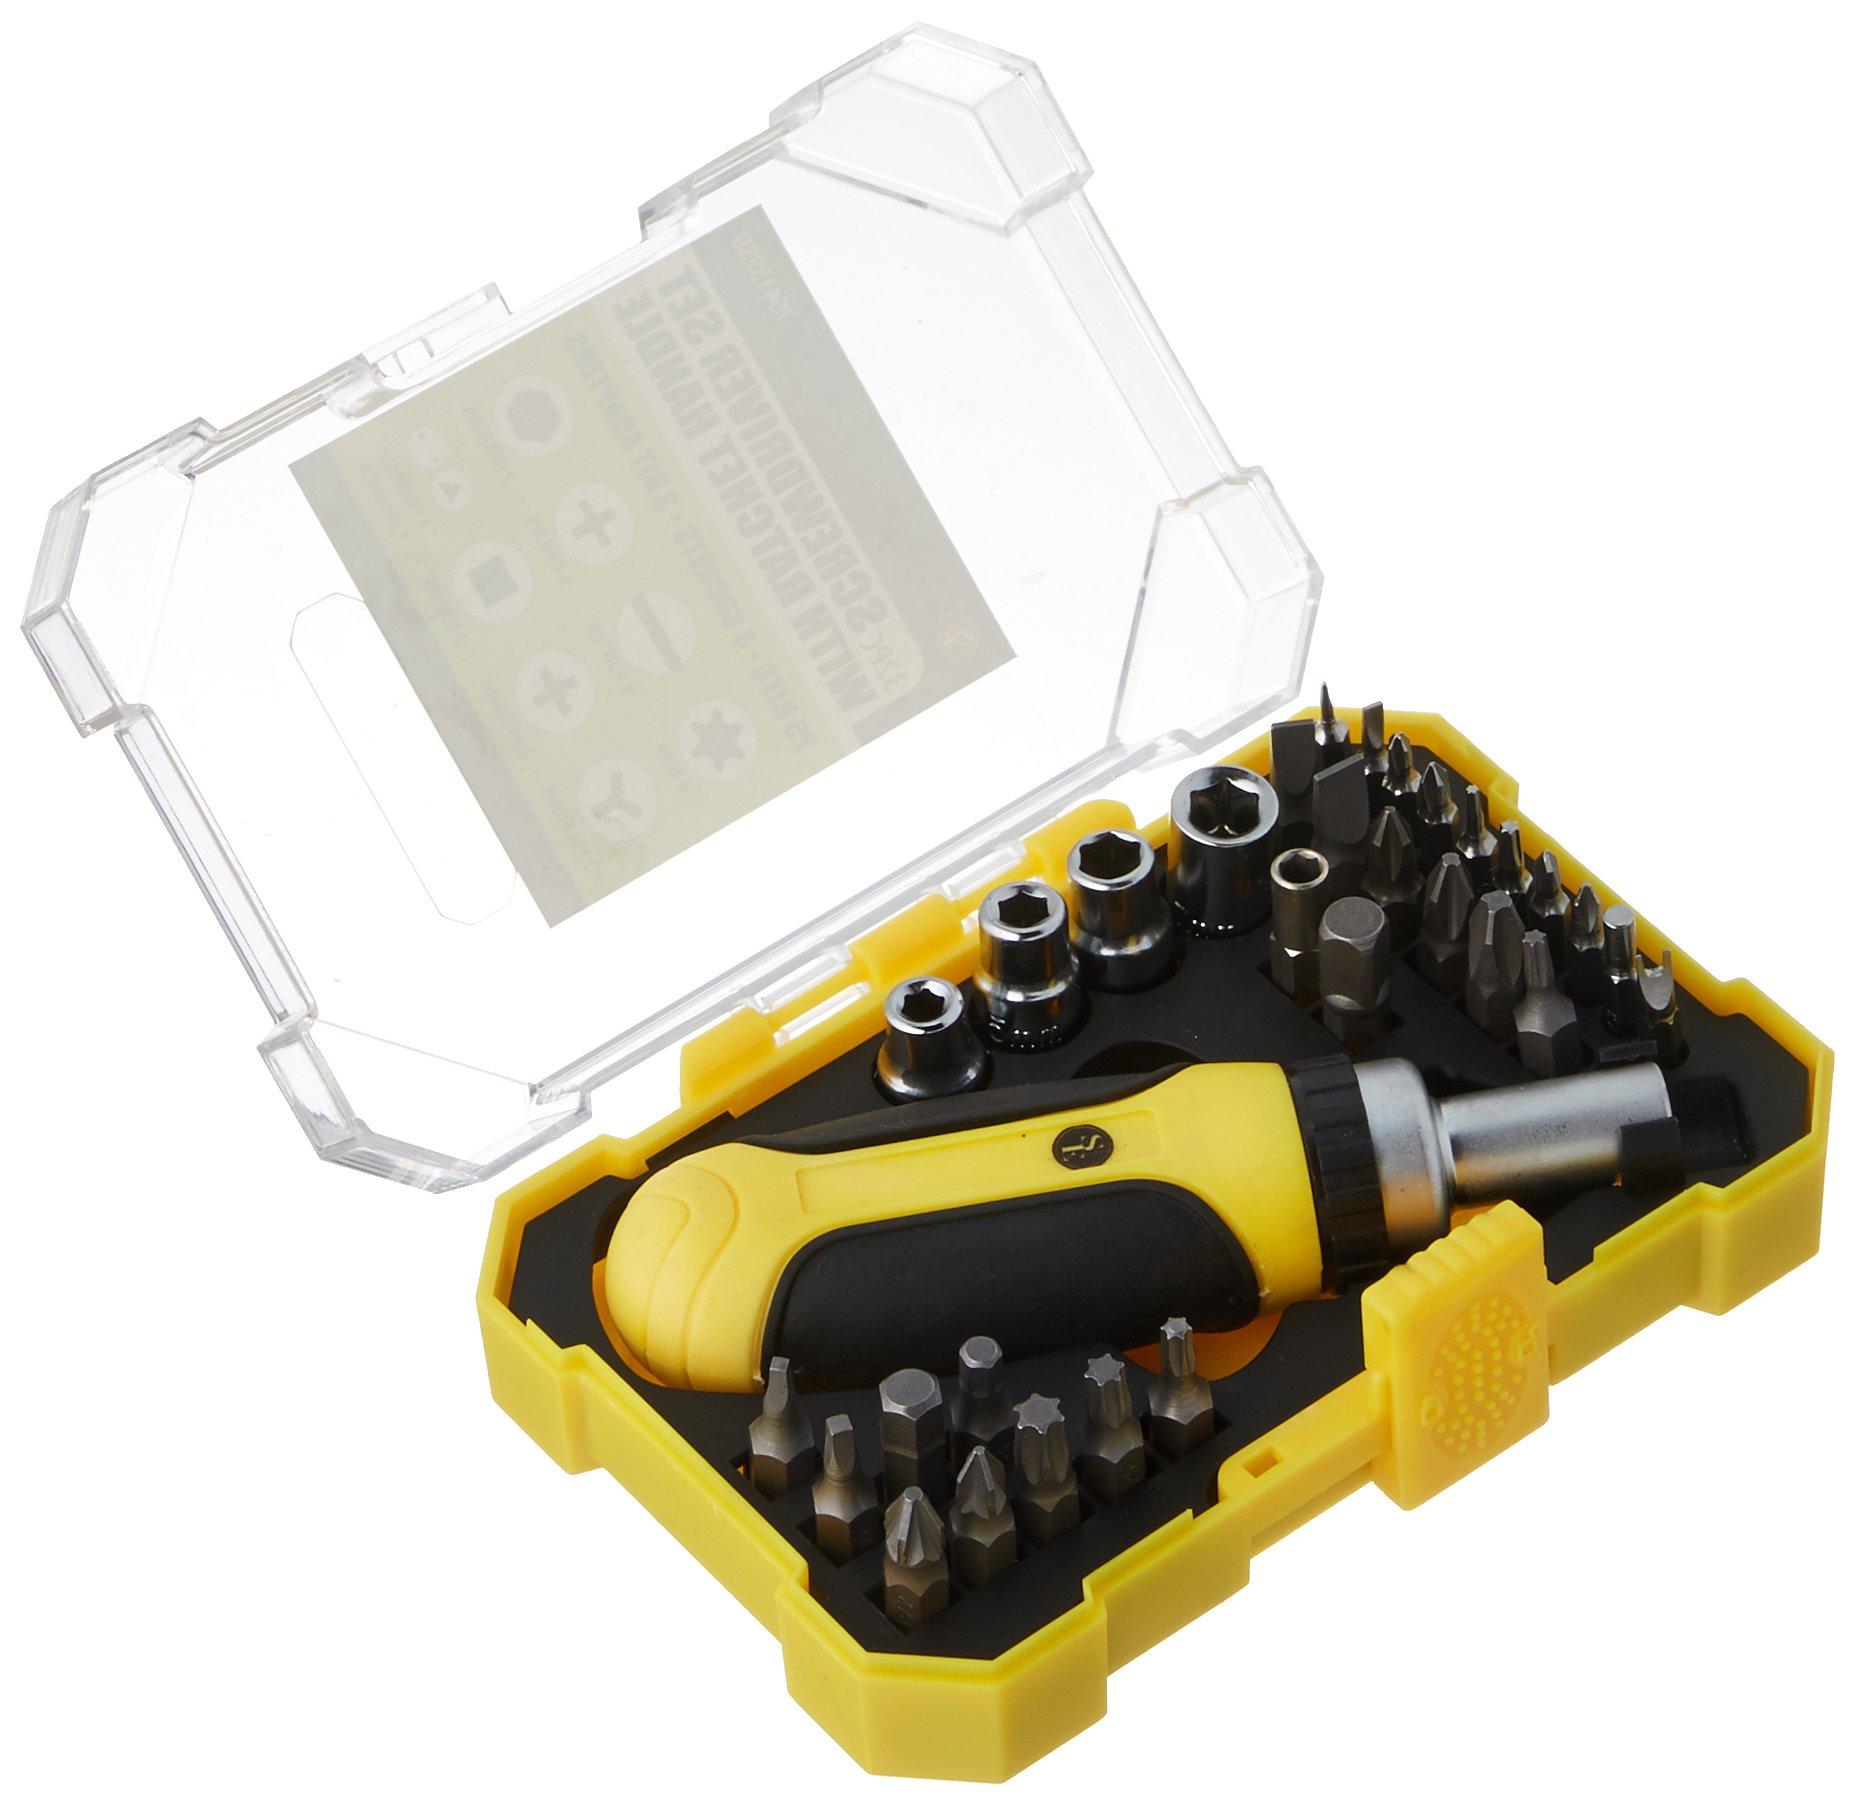 SE 754132SD Set de destornilladores con mango de trinquet...